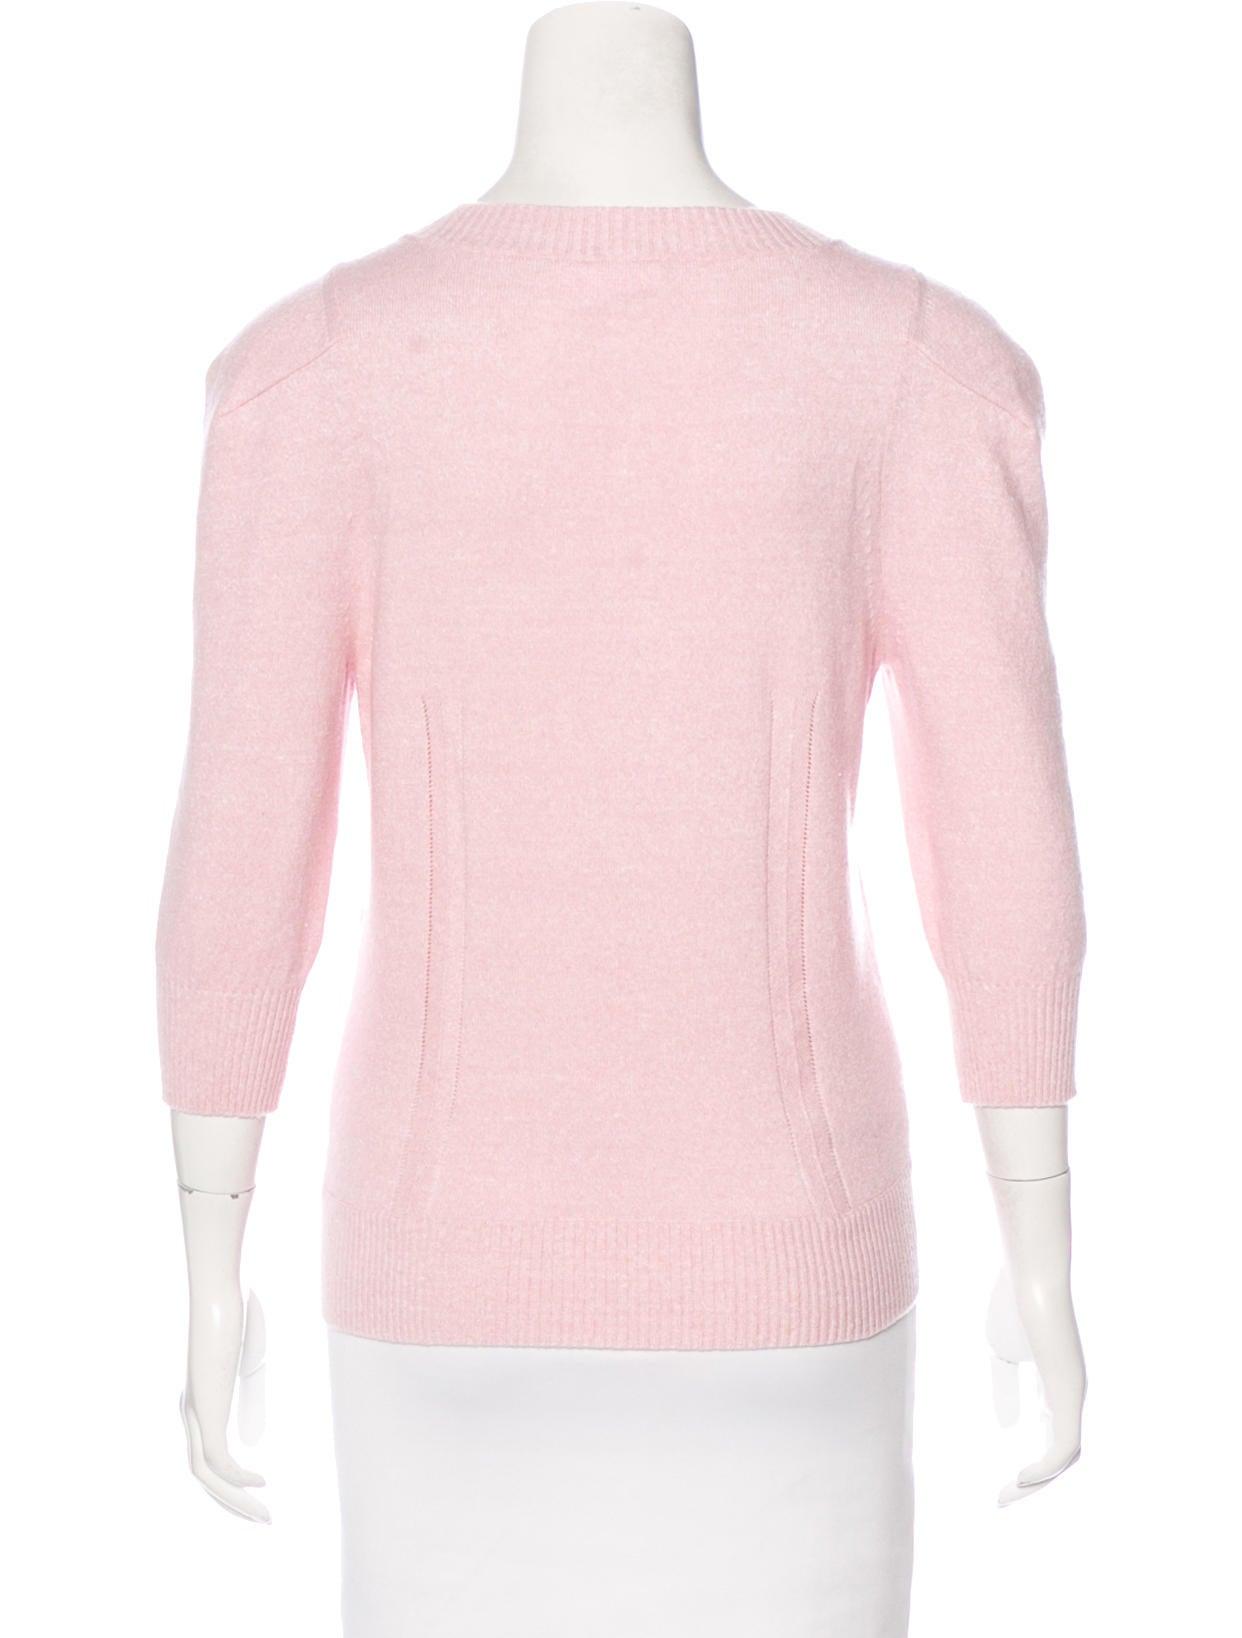 Chanel Knit Three-Quarter Sleeve Cardigan - Clothing - CHA171365 The RealReal